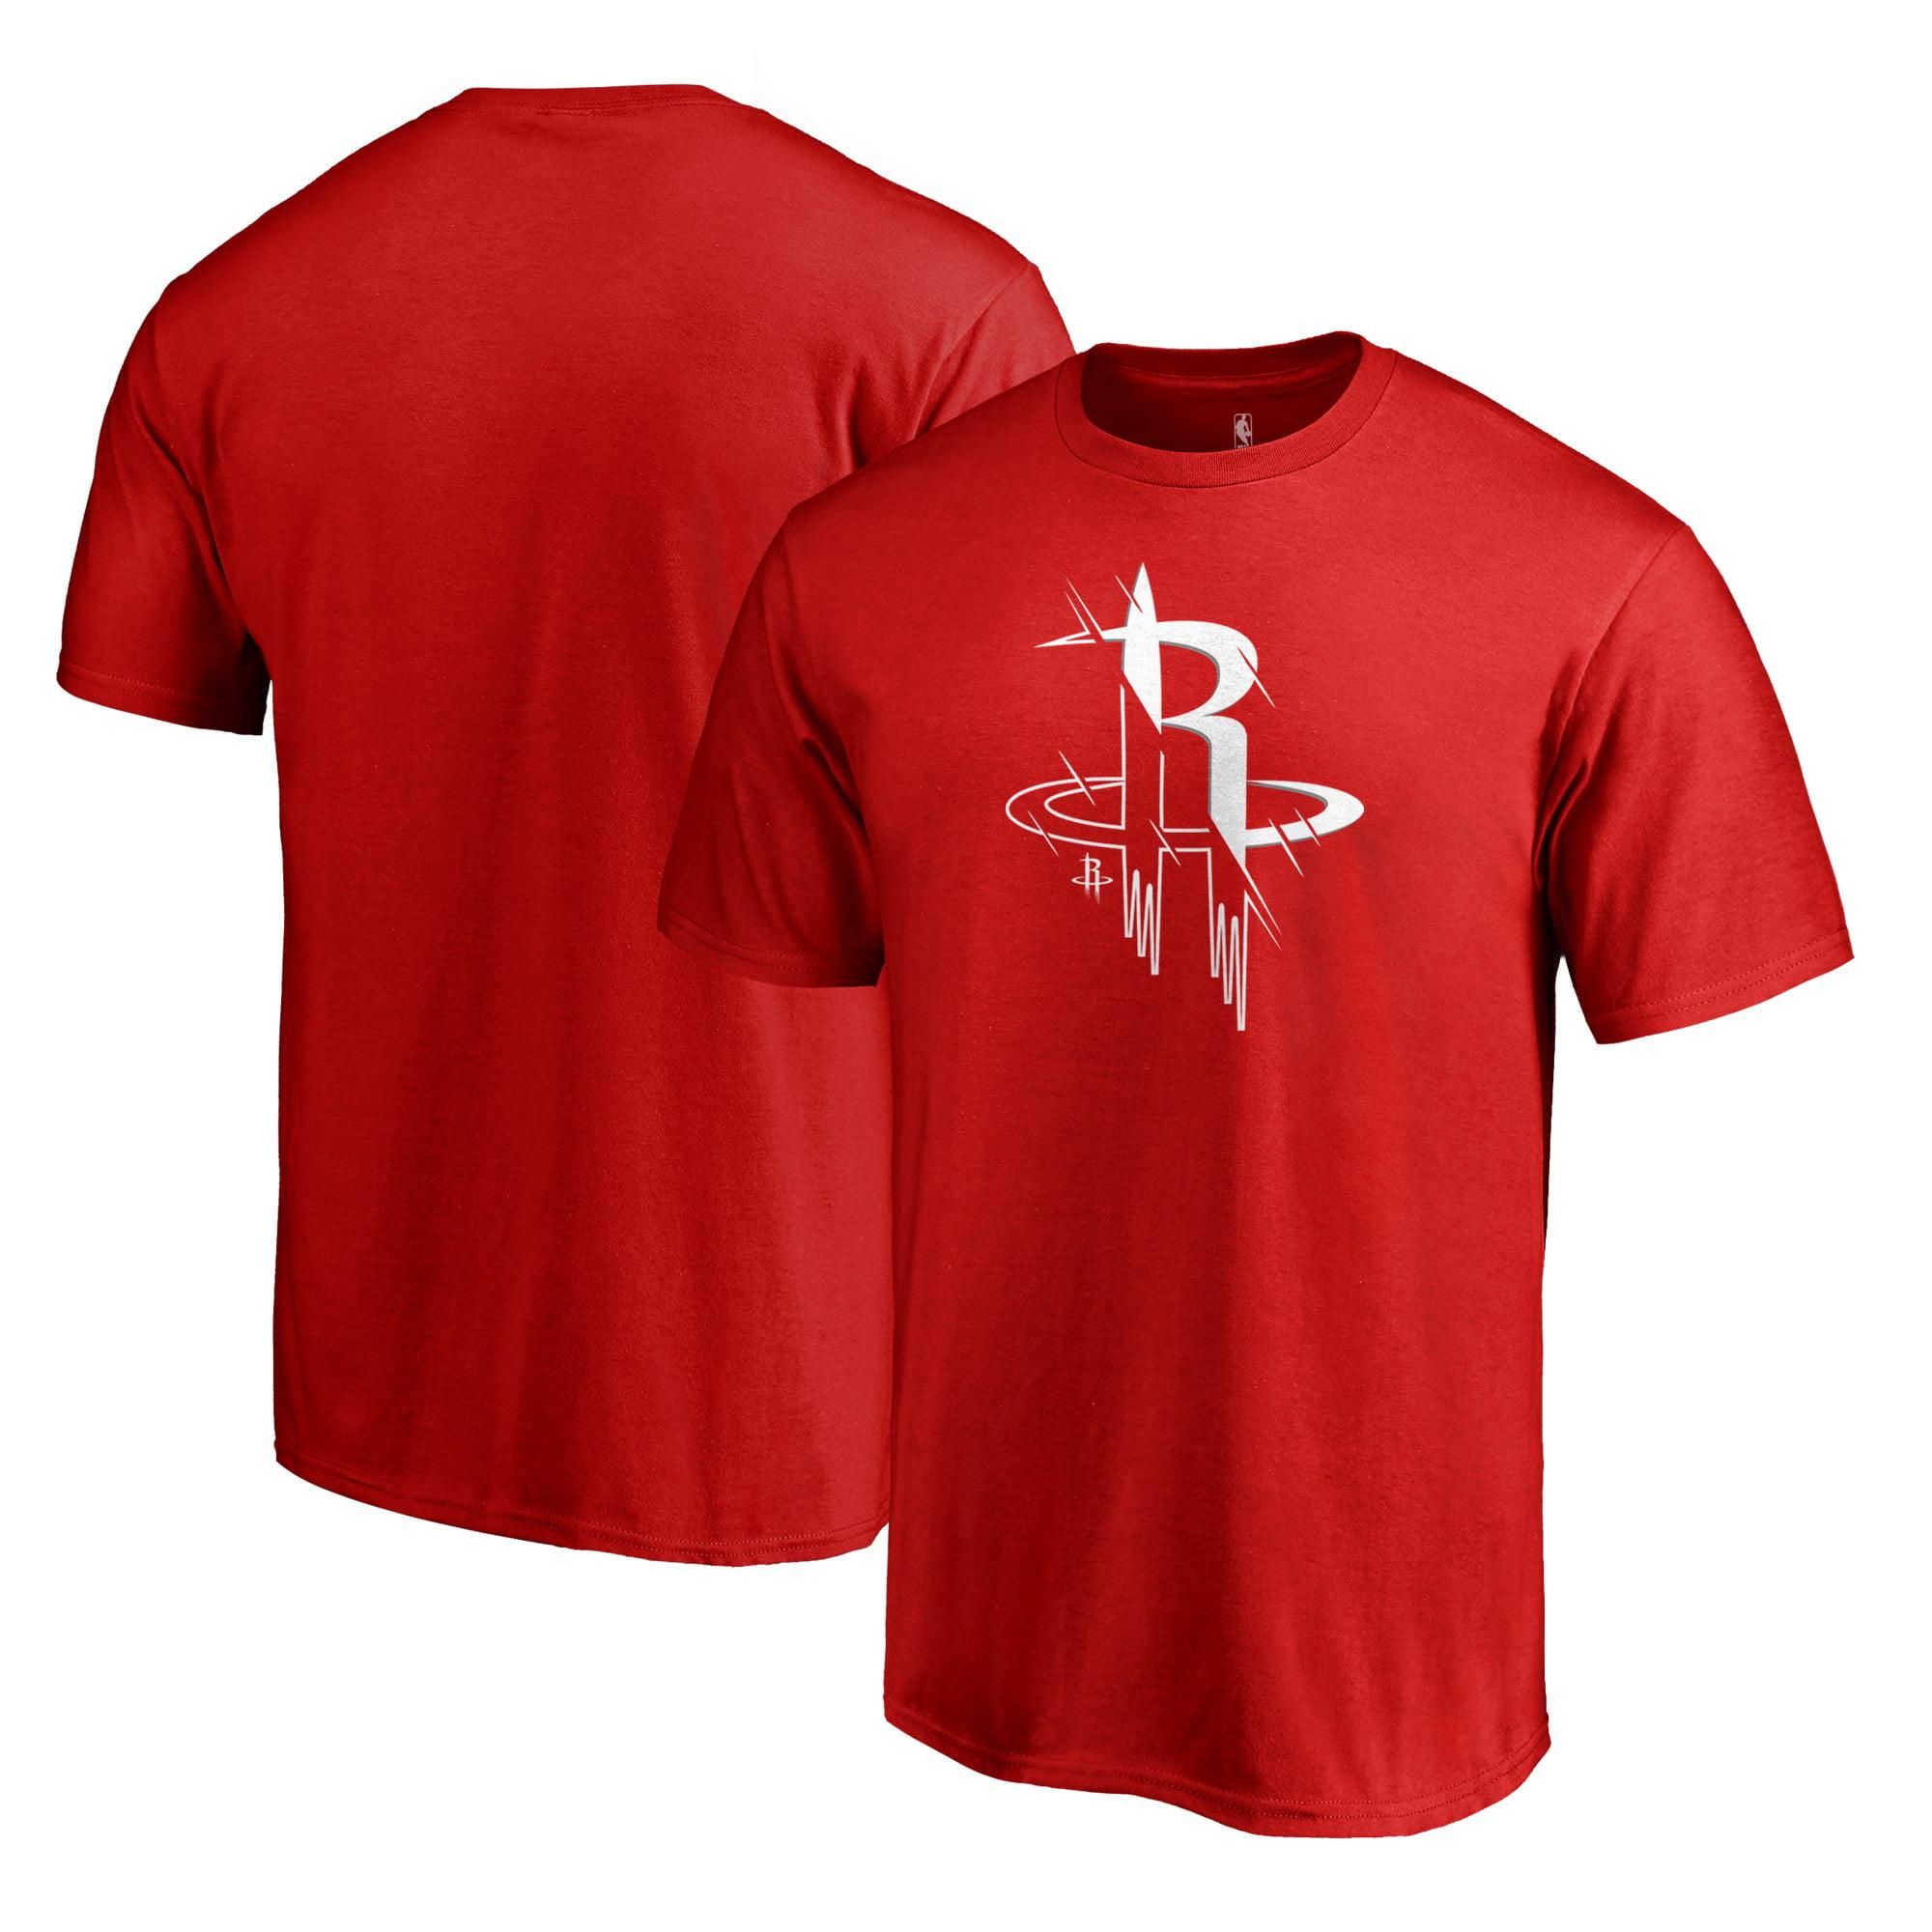 Houston Rockets Fanatics Branded Team X-Ray T-Shirt - Red